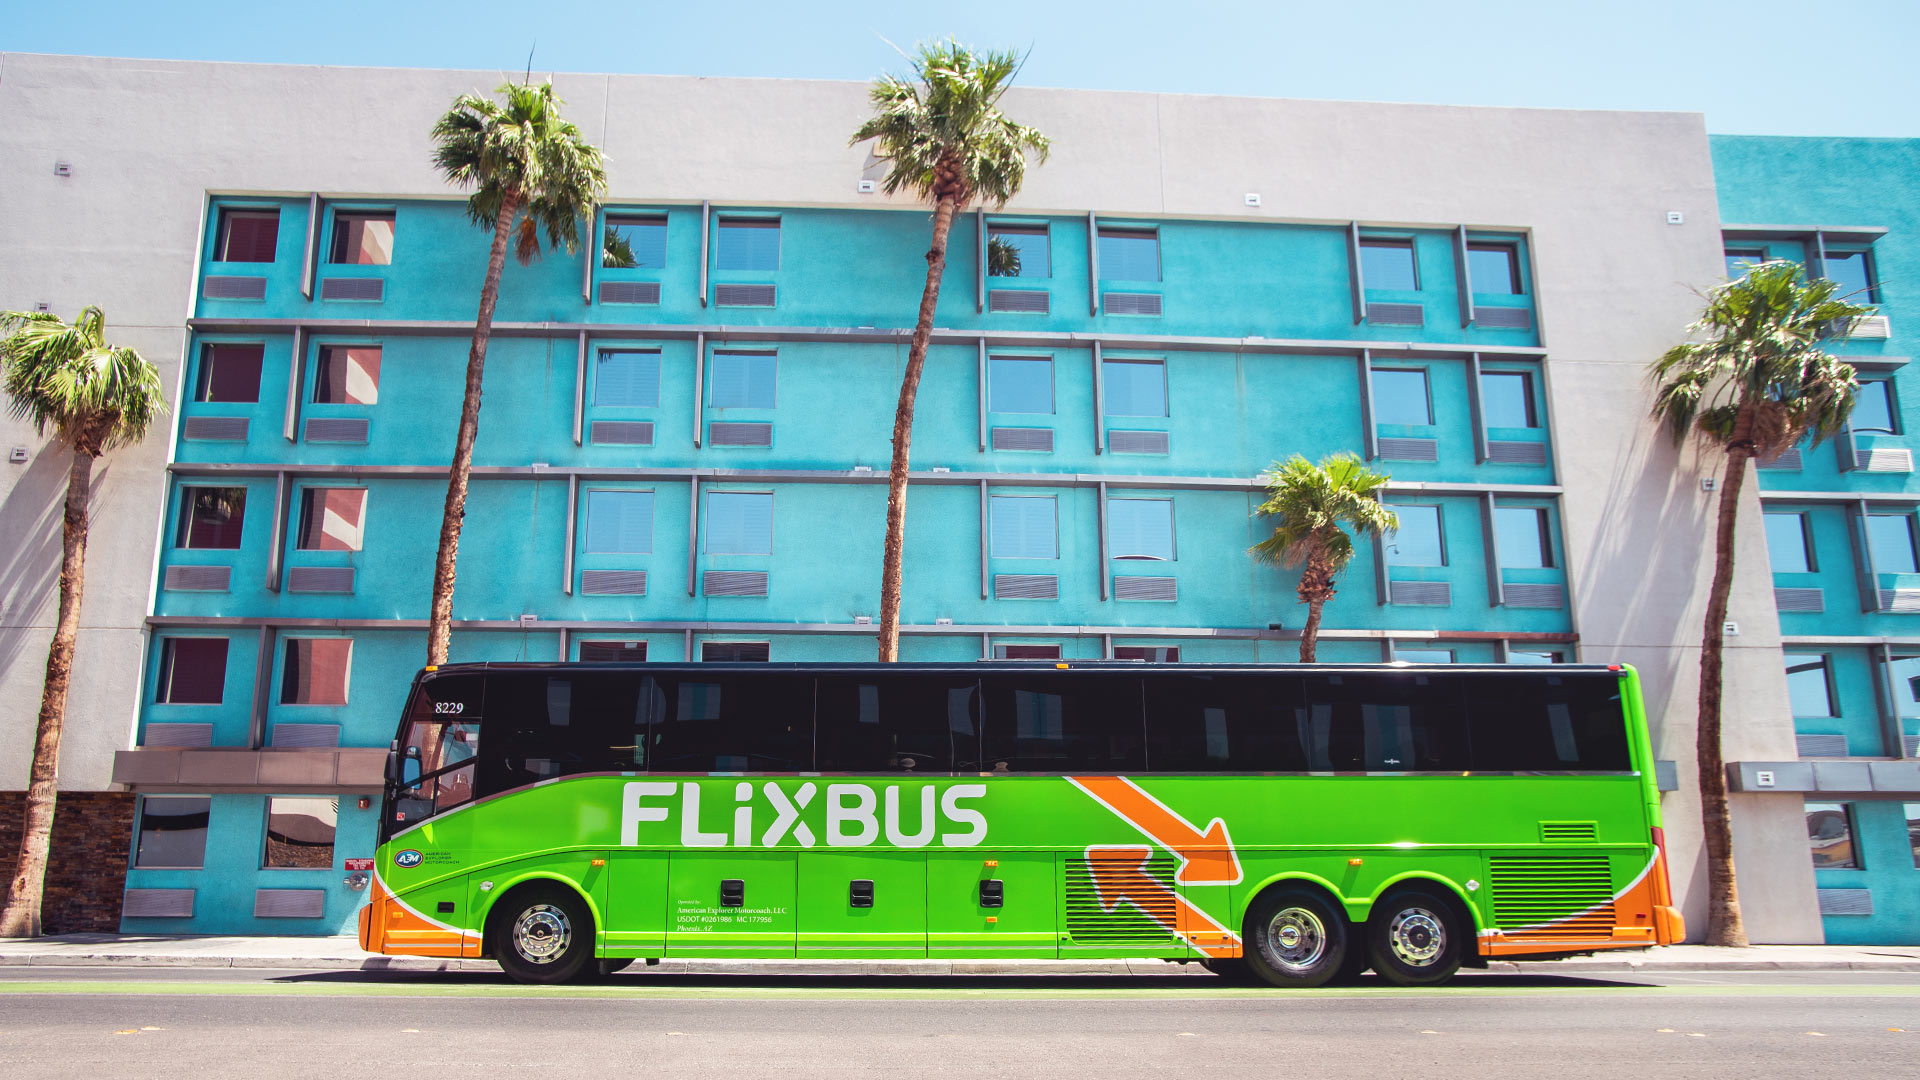 JO_FlixBus_Cali-Bus-Image